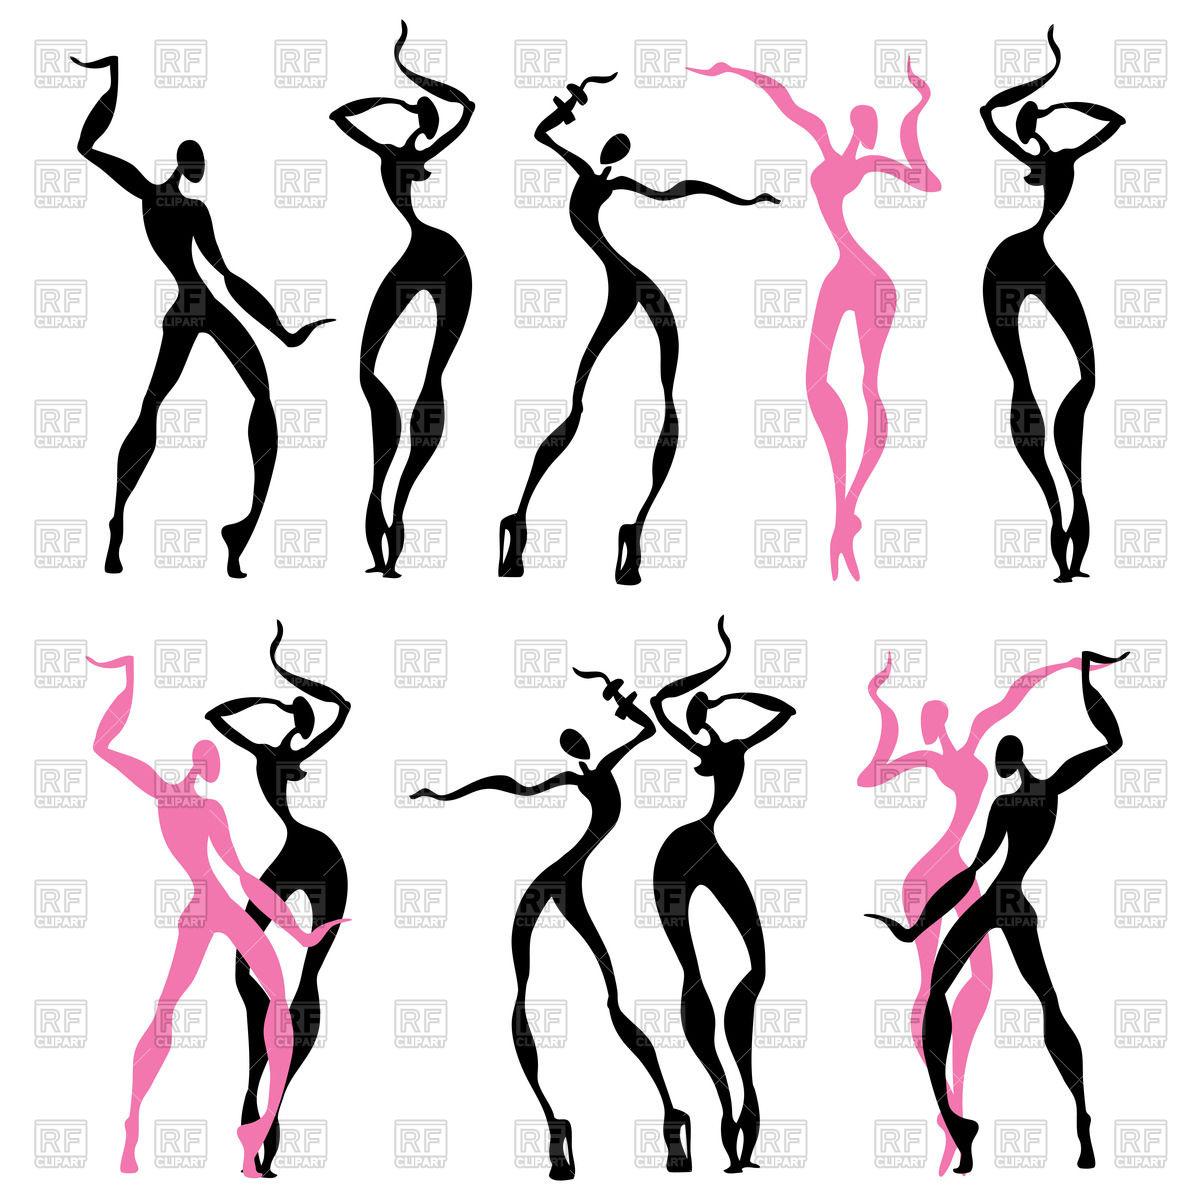 1200x1200 Silhouette Of Women's Abstract Dancing Figures Vector Image